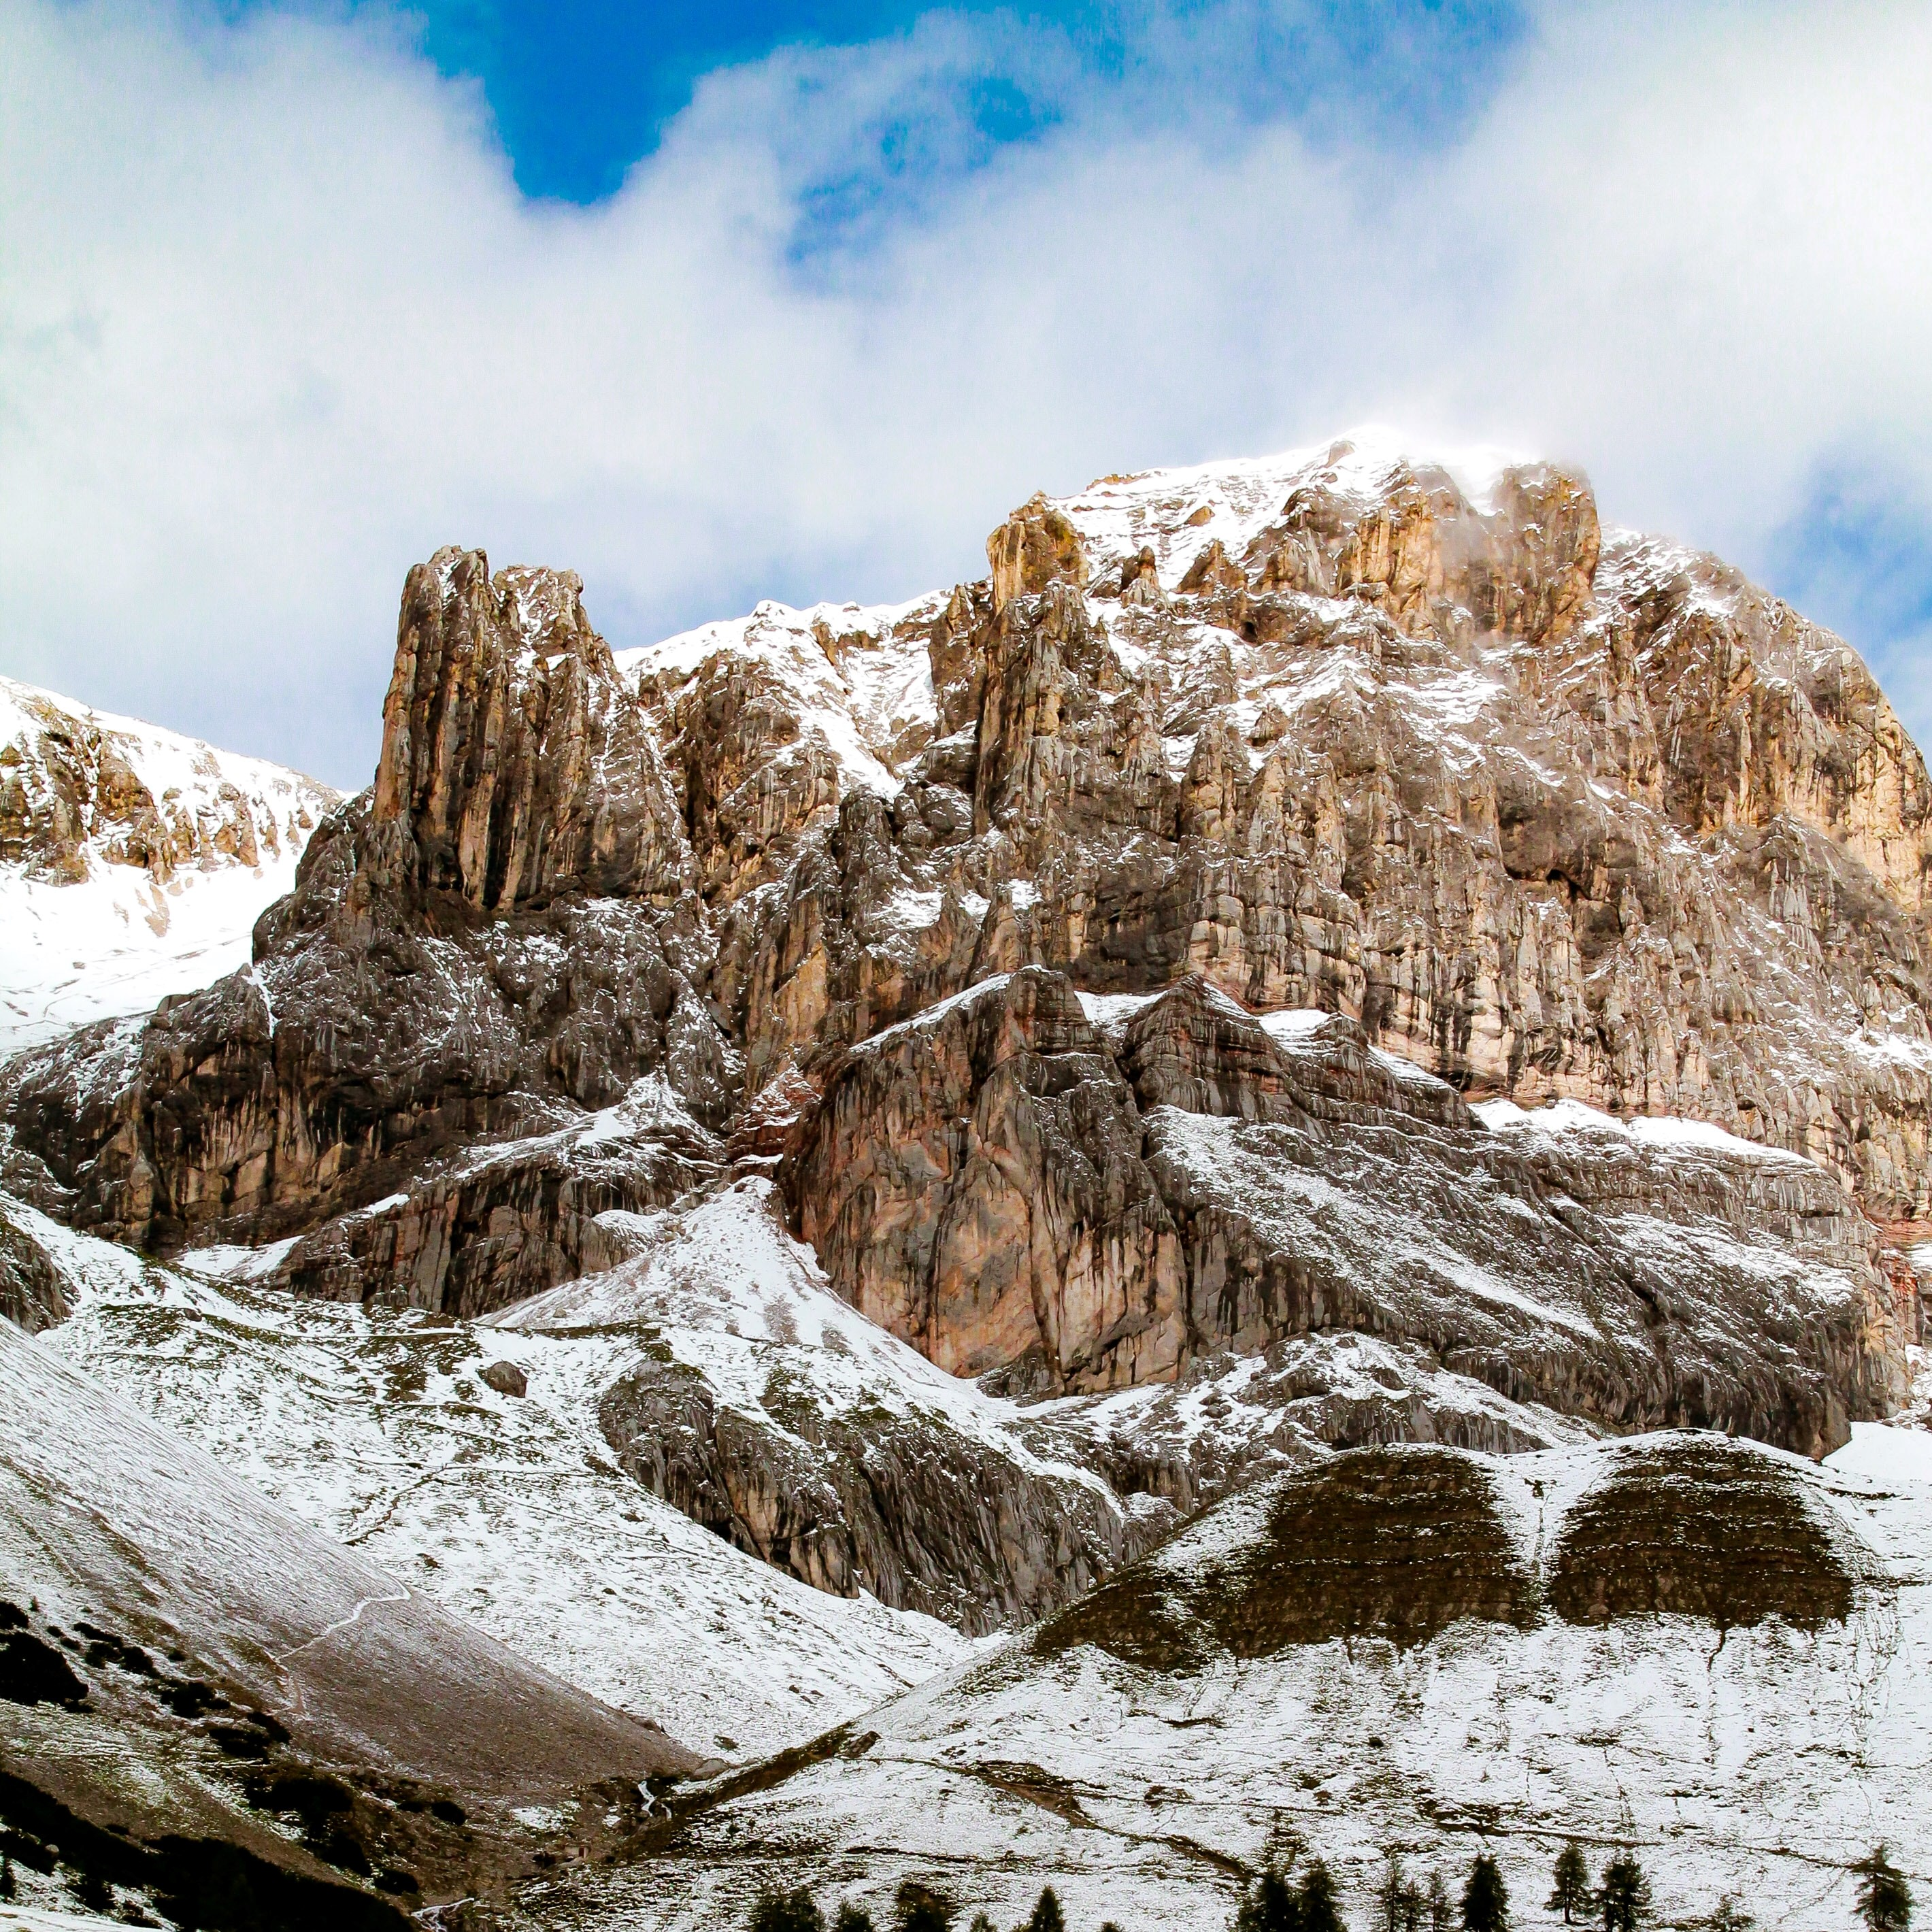 Trentino Alto Adige Artigianato turismo enogastronomico trentino alto adige - roberta garibaldi